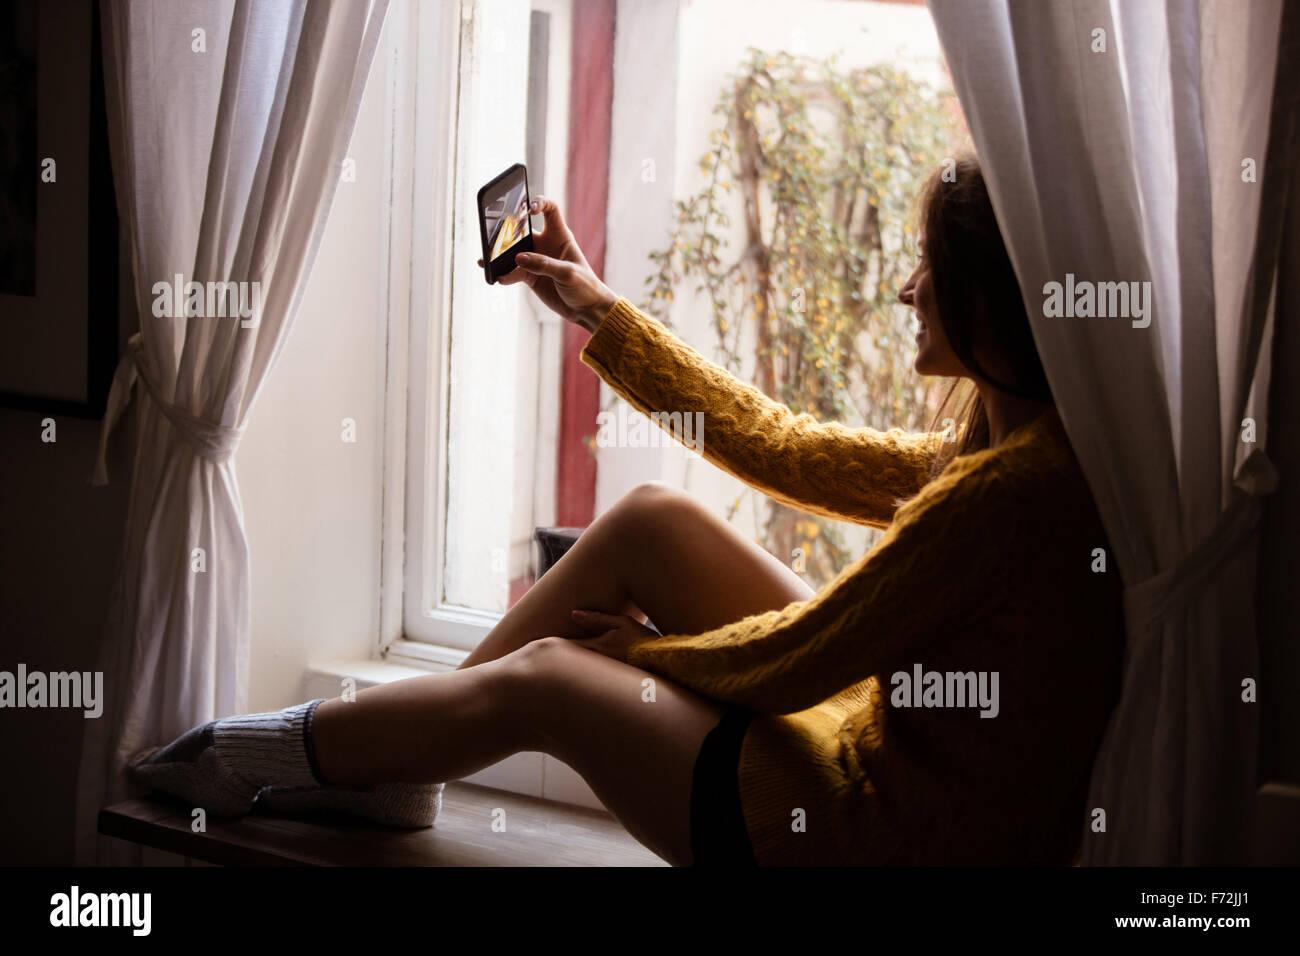 Junge Frau, die eine Selfie am Fenster Stockfoto